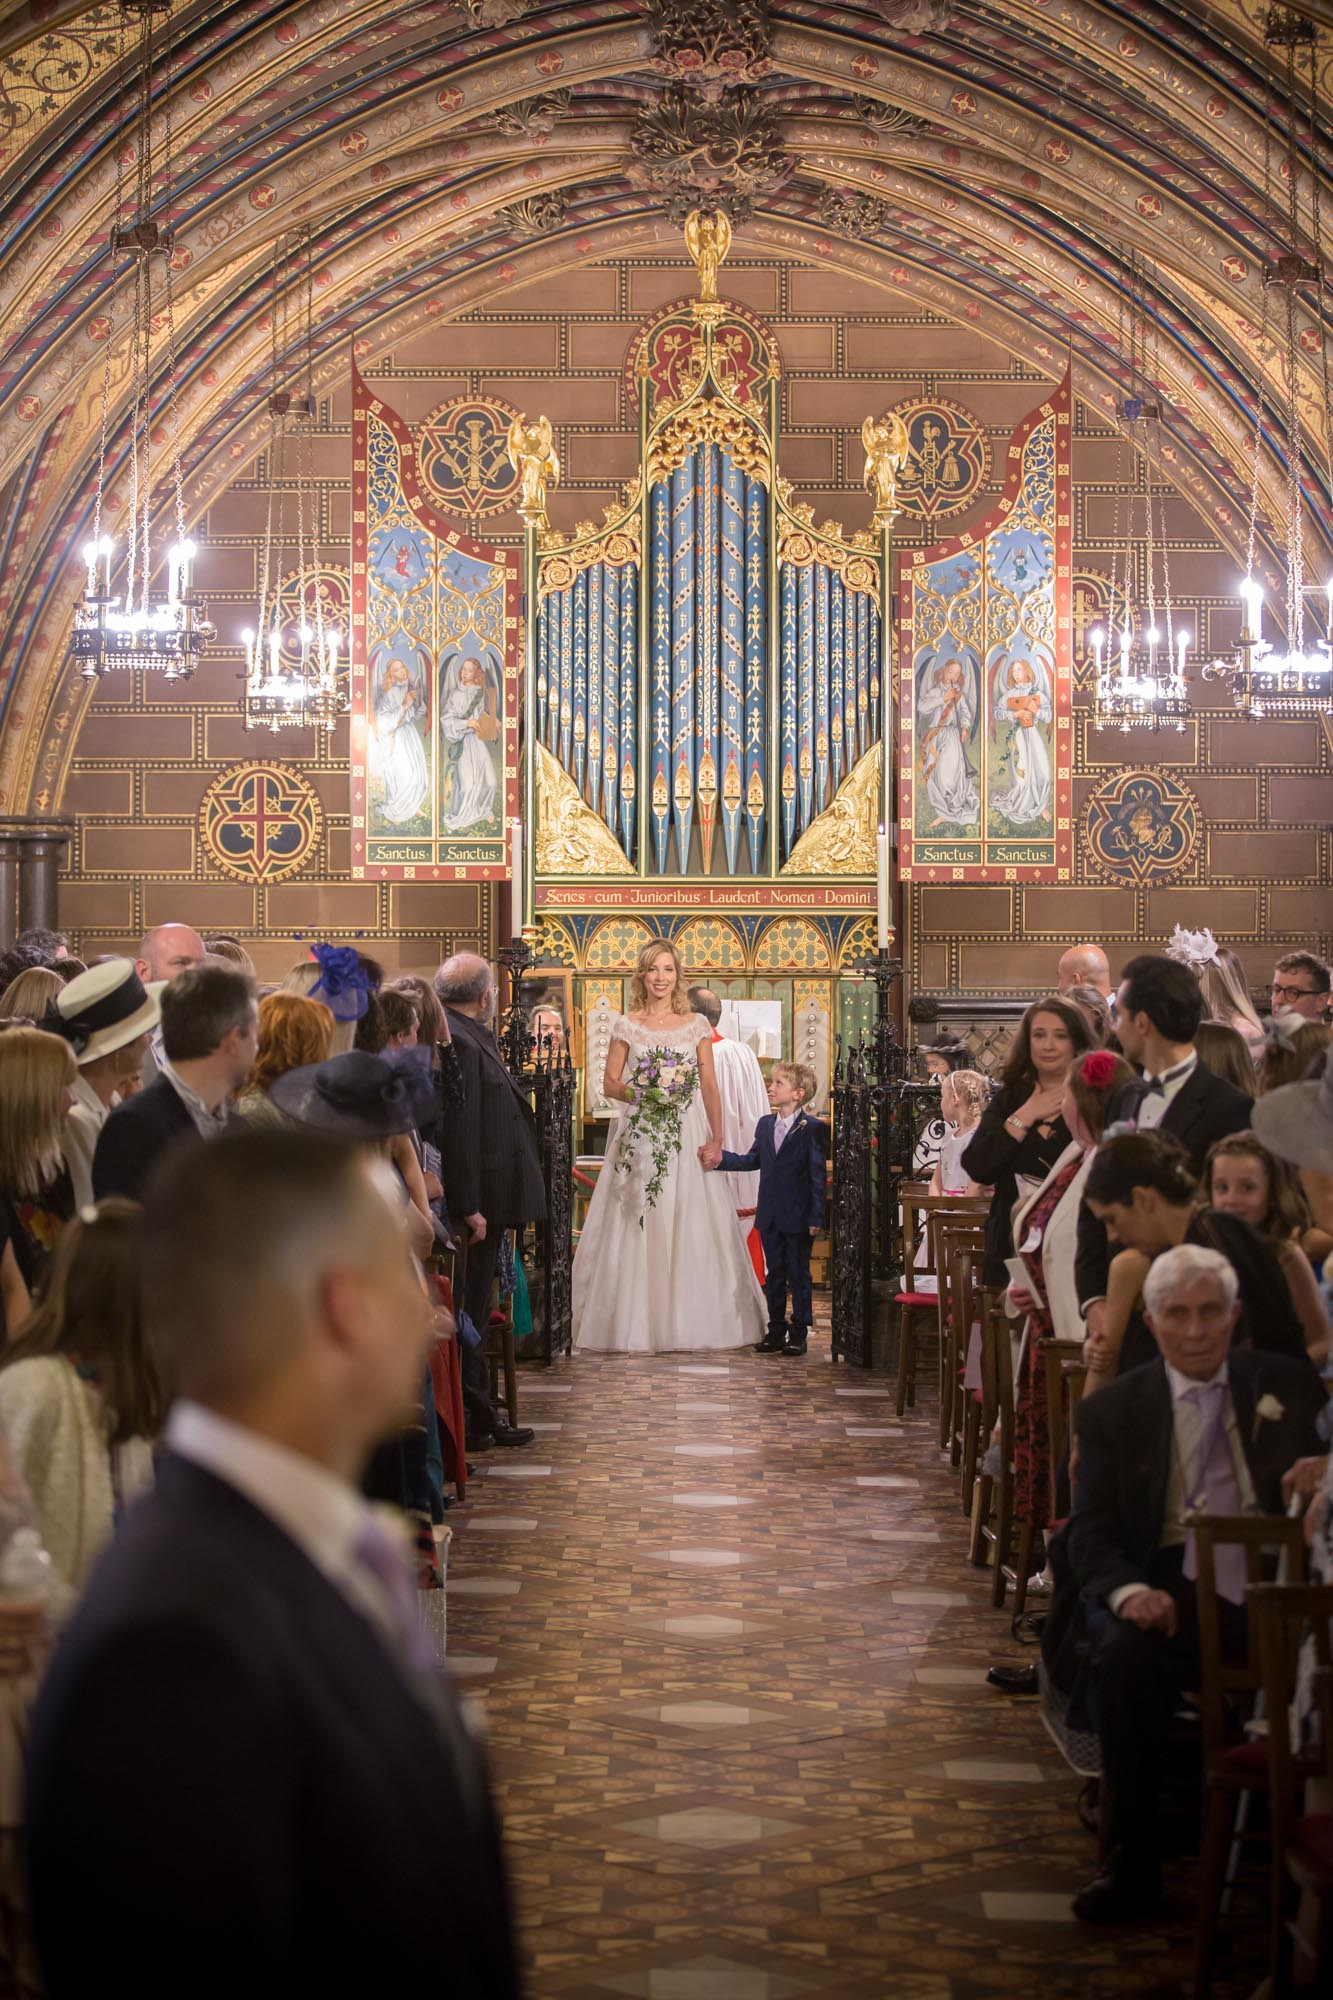 weddings-couples-love-photographer-oxford-london-jonathan-self-photography-24.jpg